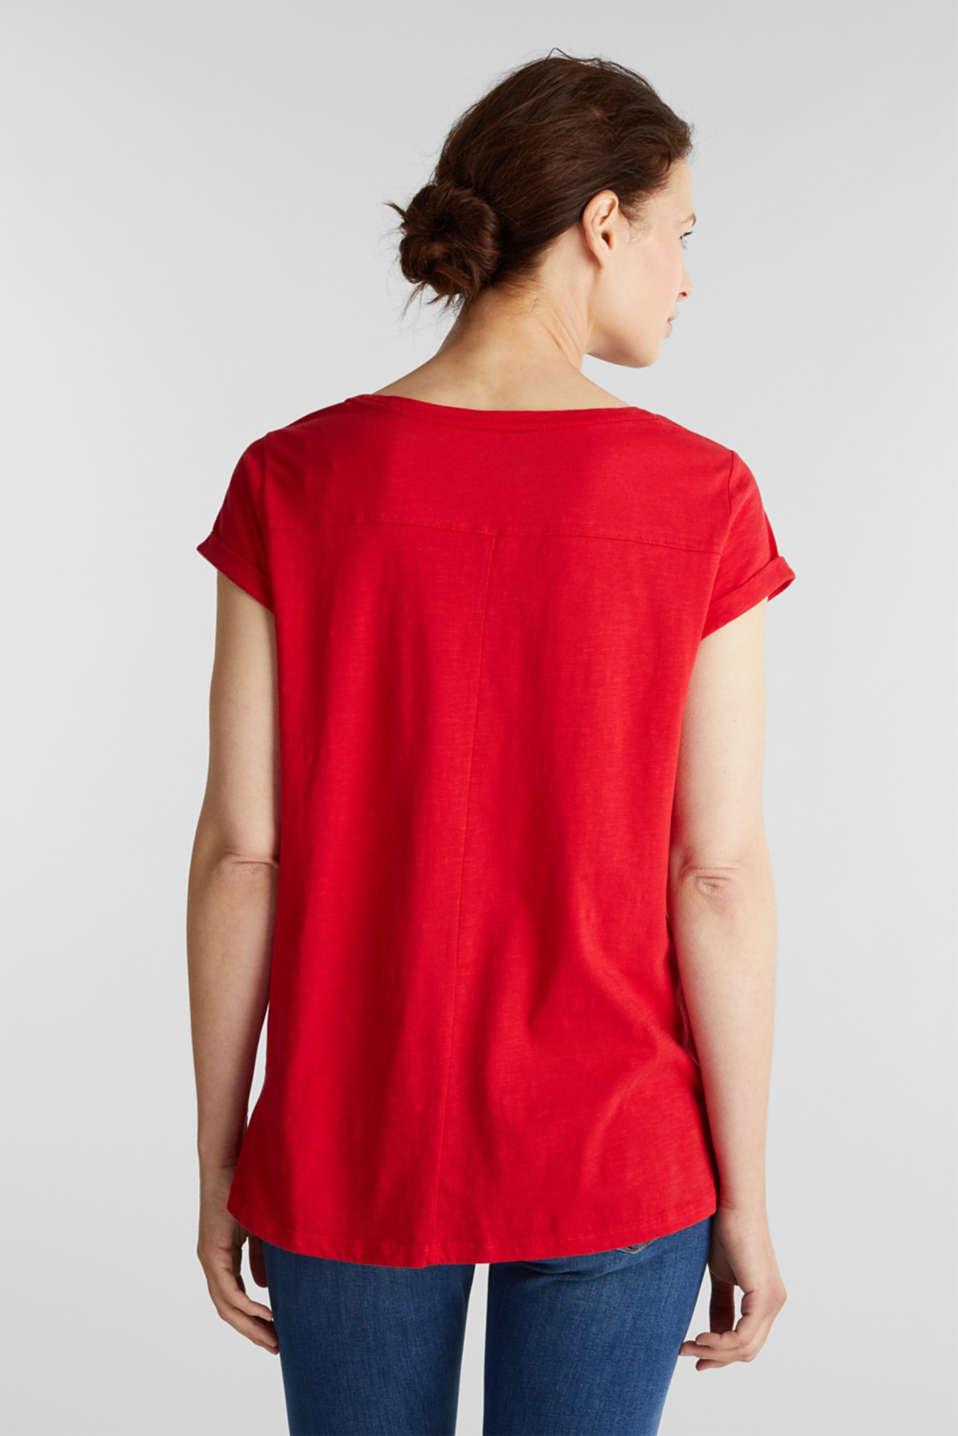 Airy slub top, 100% cotton, DARK RED, detail image number 3